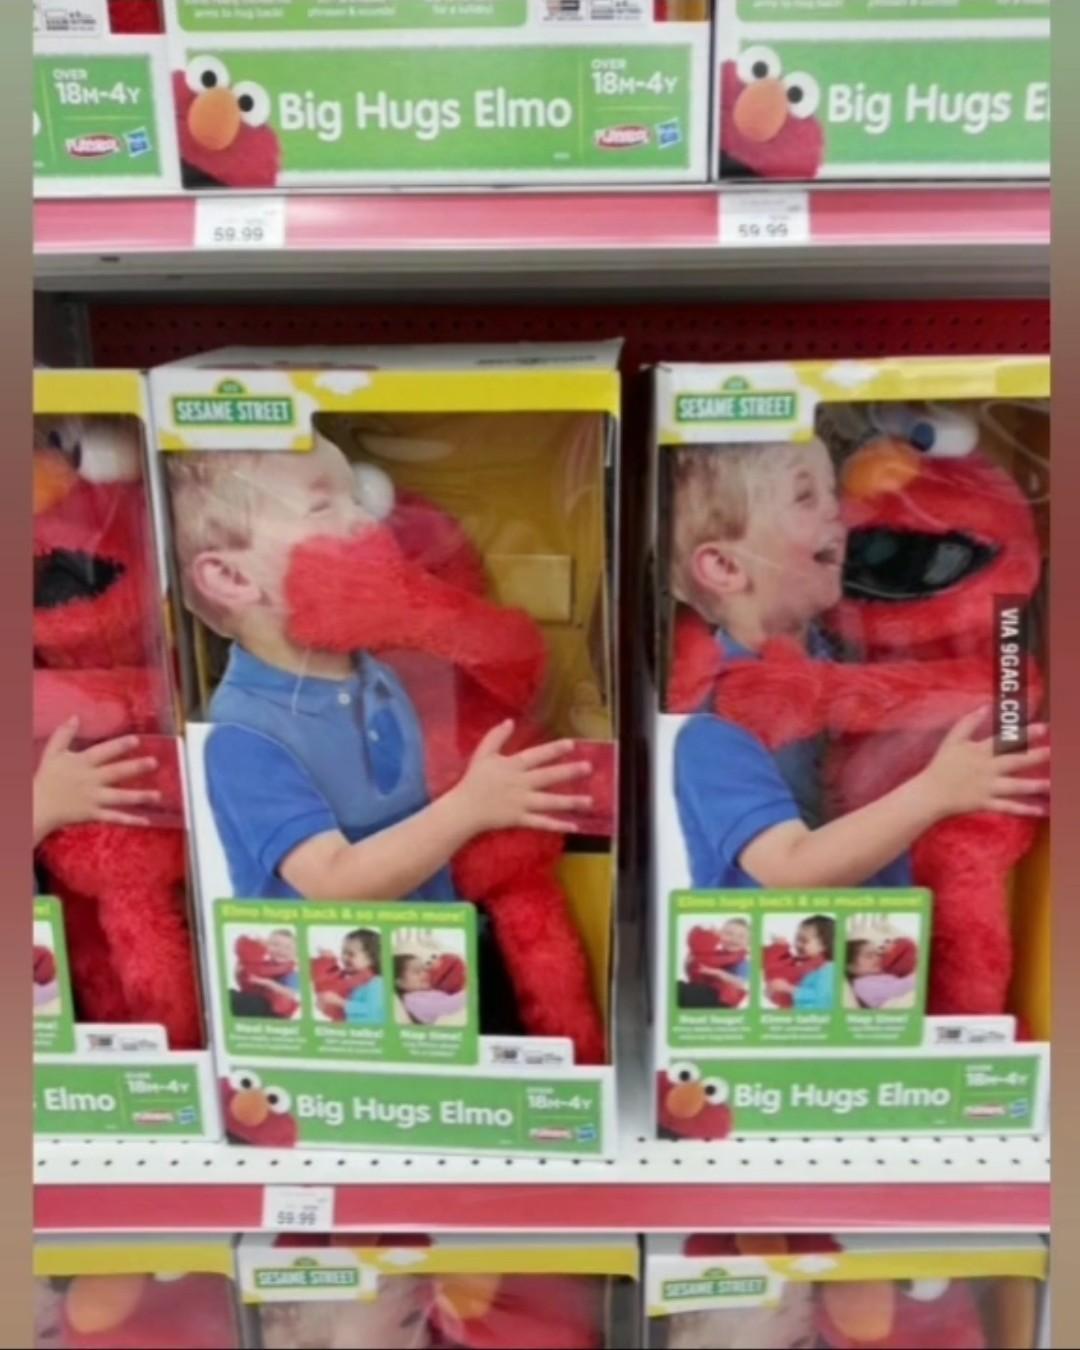 Elmo quiere tu riñon - meme